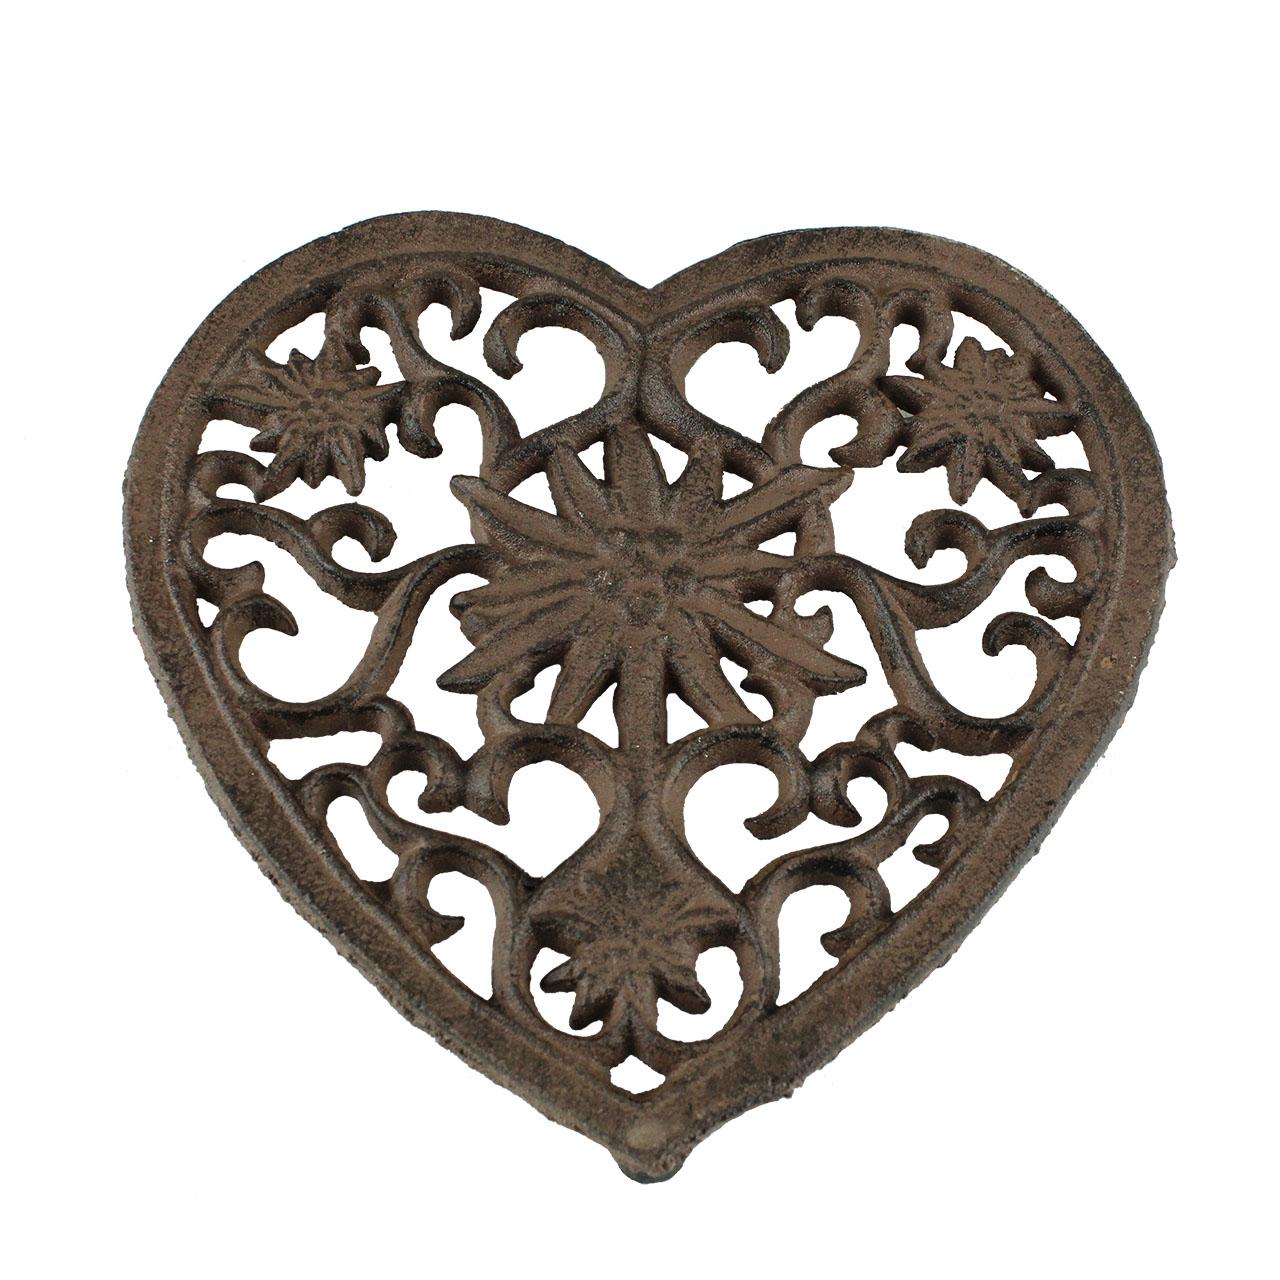 Suport Pentru Vase Fierbinti Inima Din Metal Maro